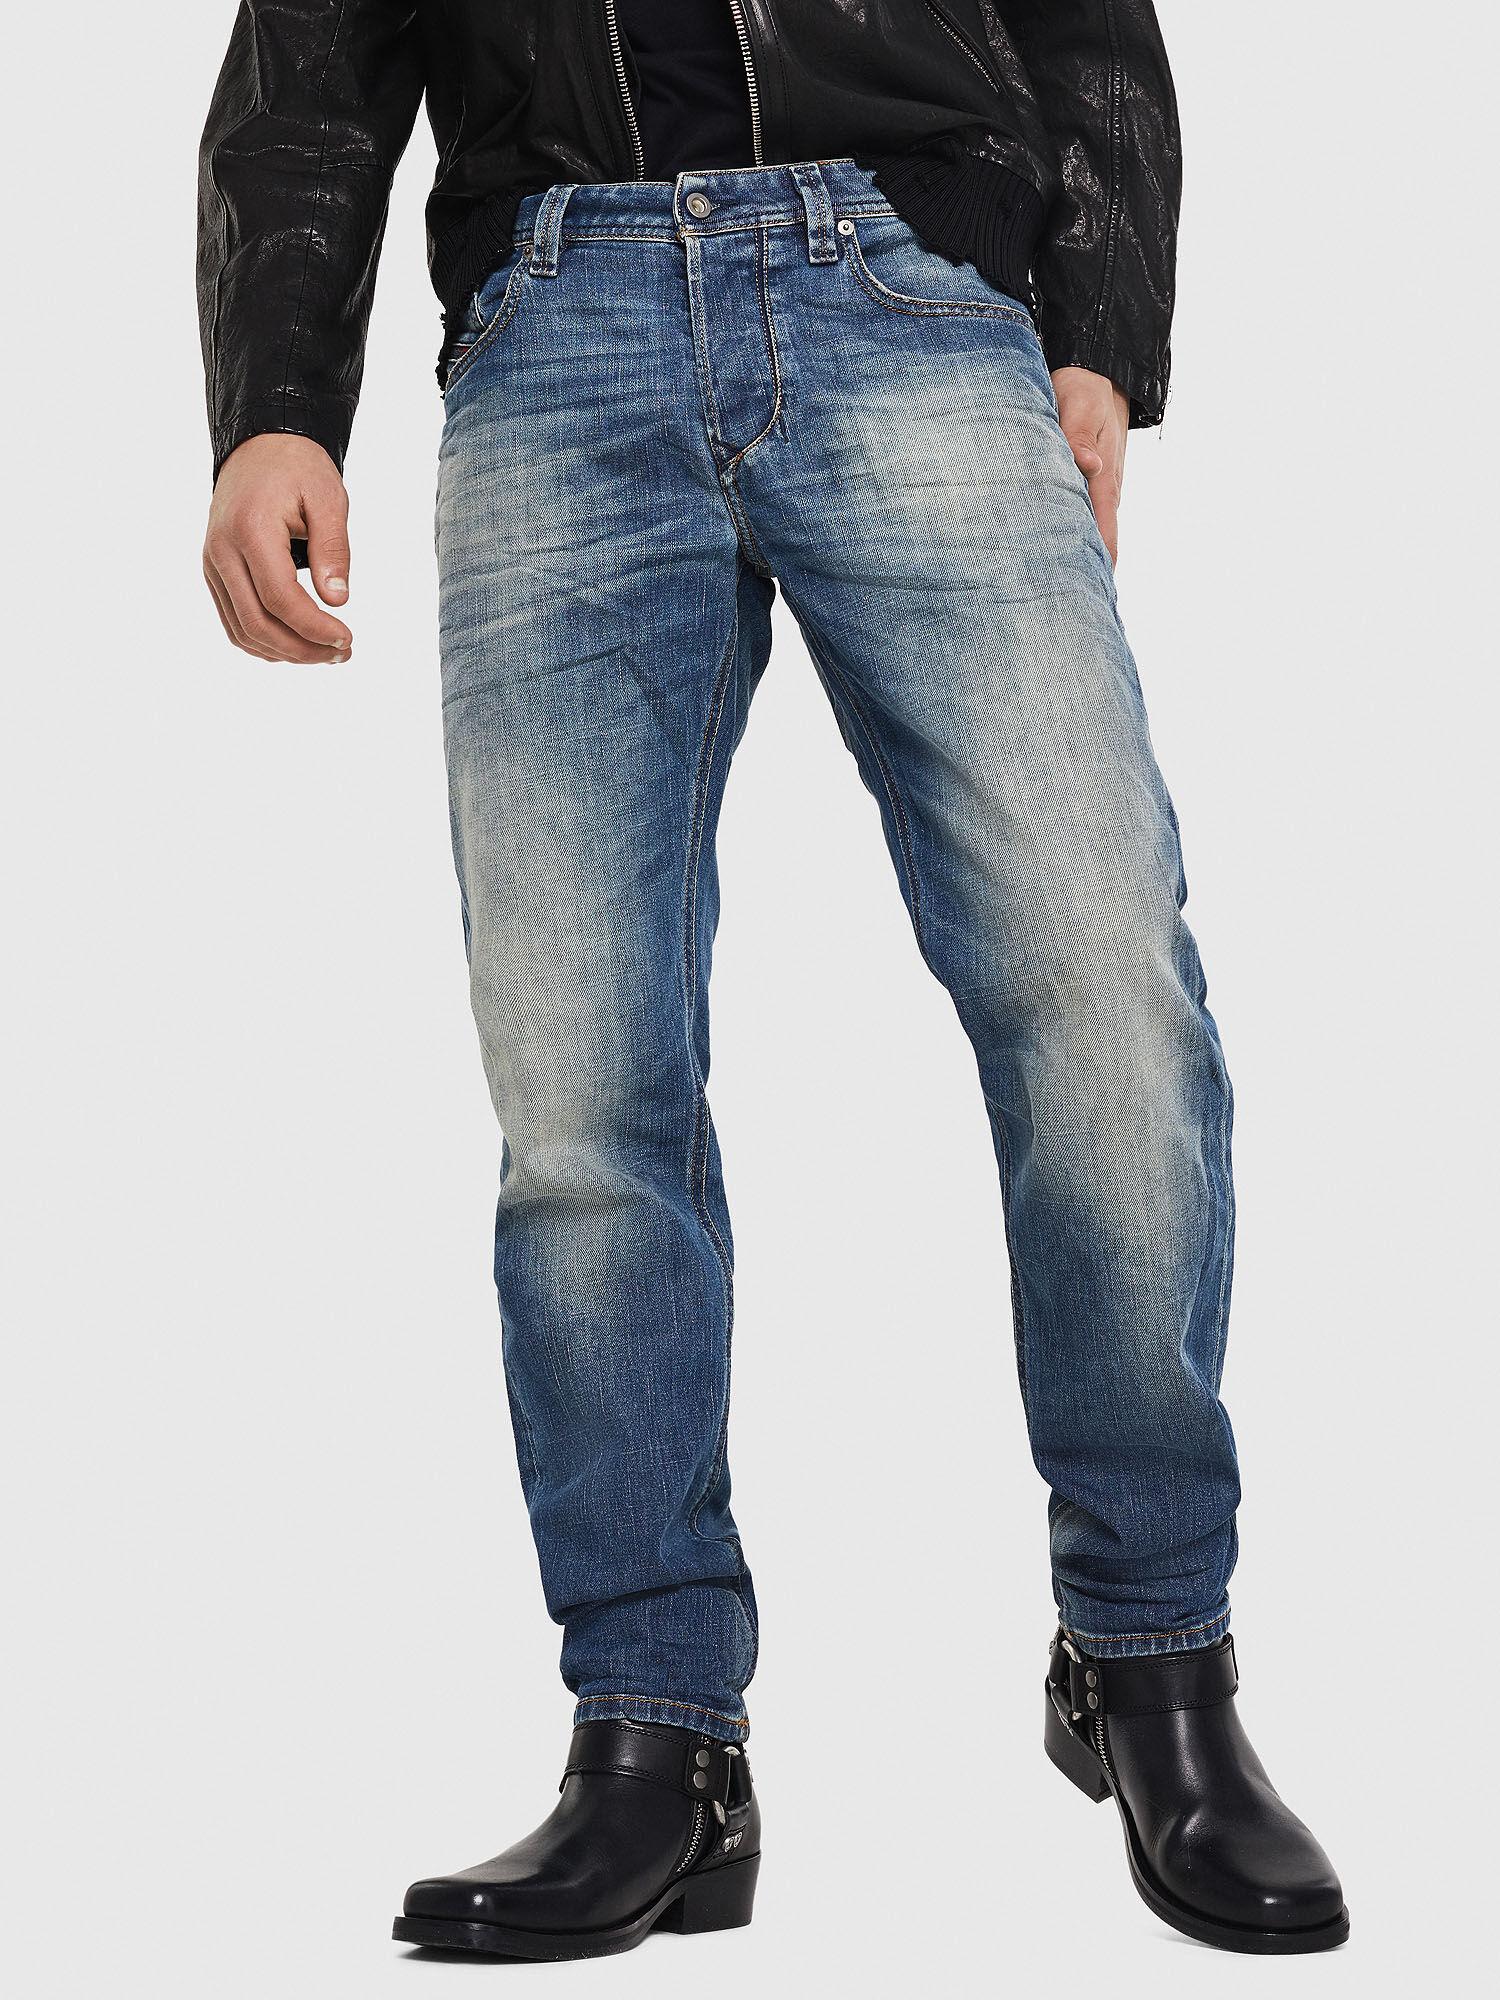 615249e0 Herrenmode Beex 084NR Tapered Regular Dark Indigo Medium-treated Diesel  Jeans Larkee